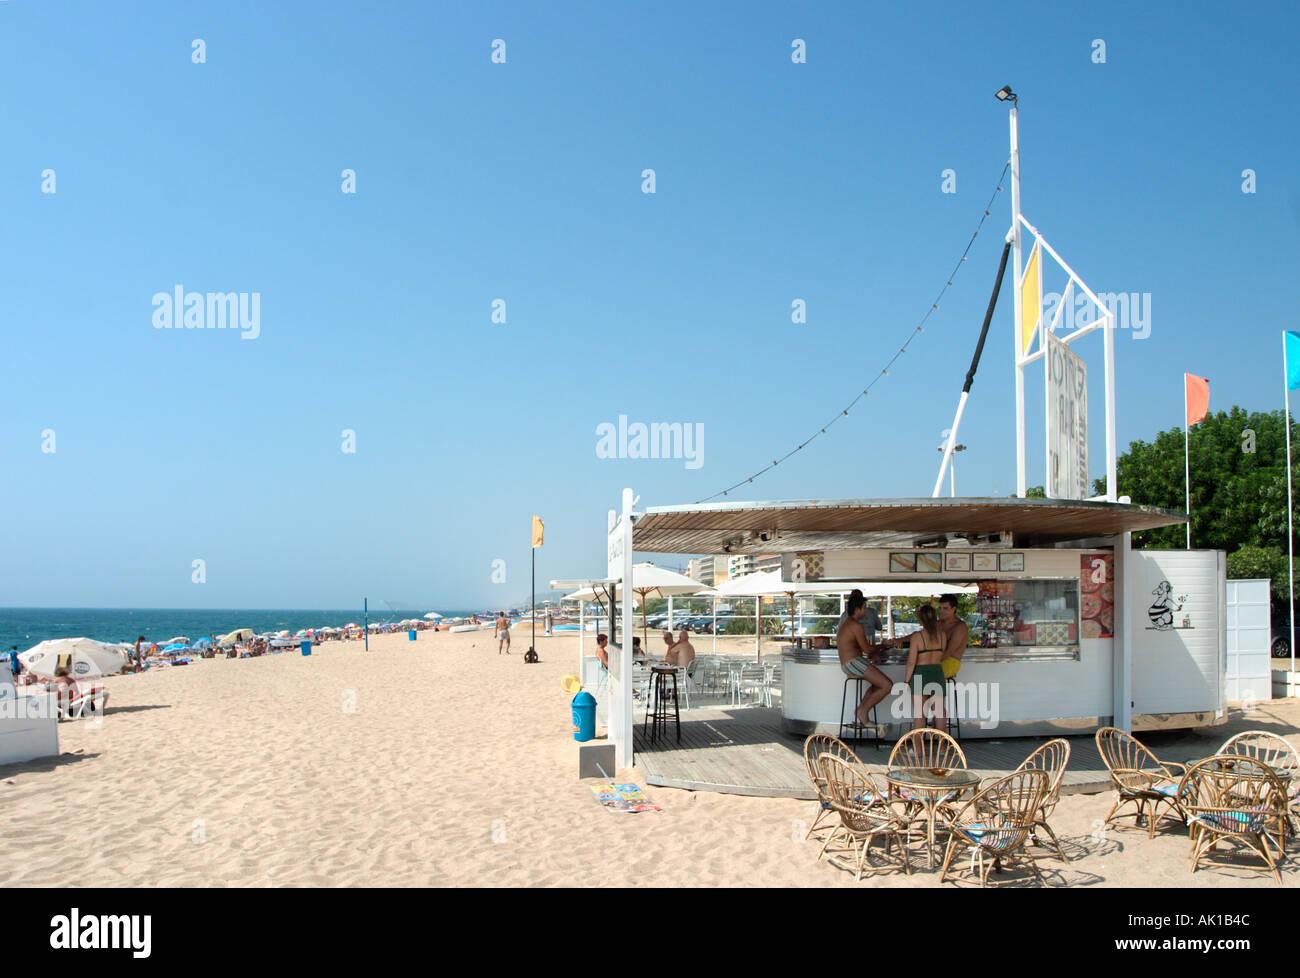 Beach bar on the beach at pineda de mar costa brava for Restaurant pineda de mar